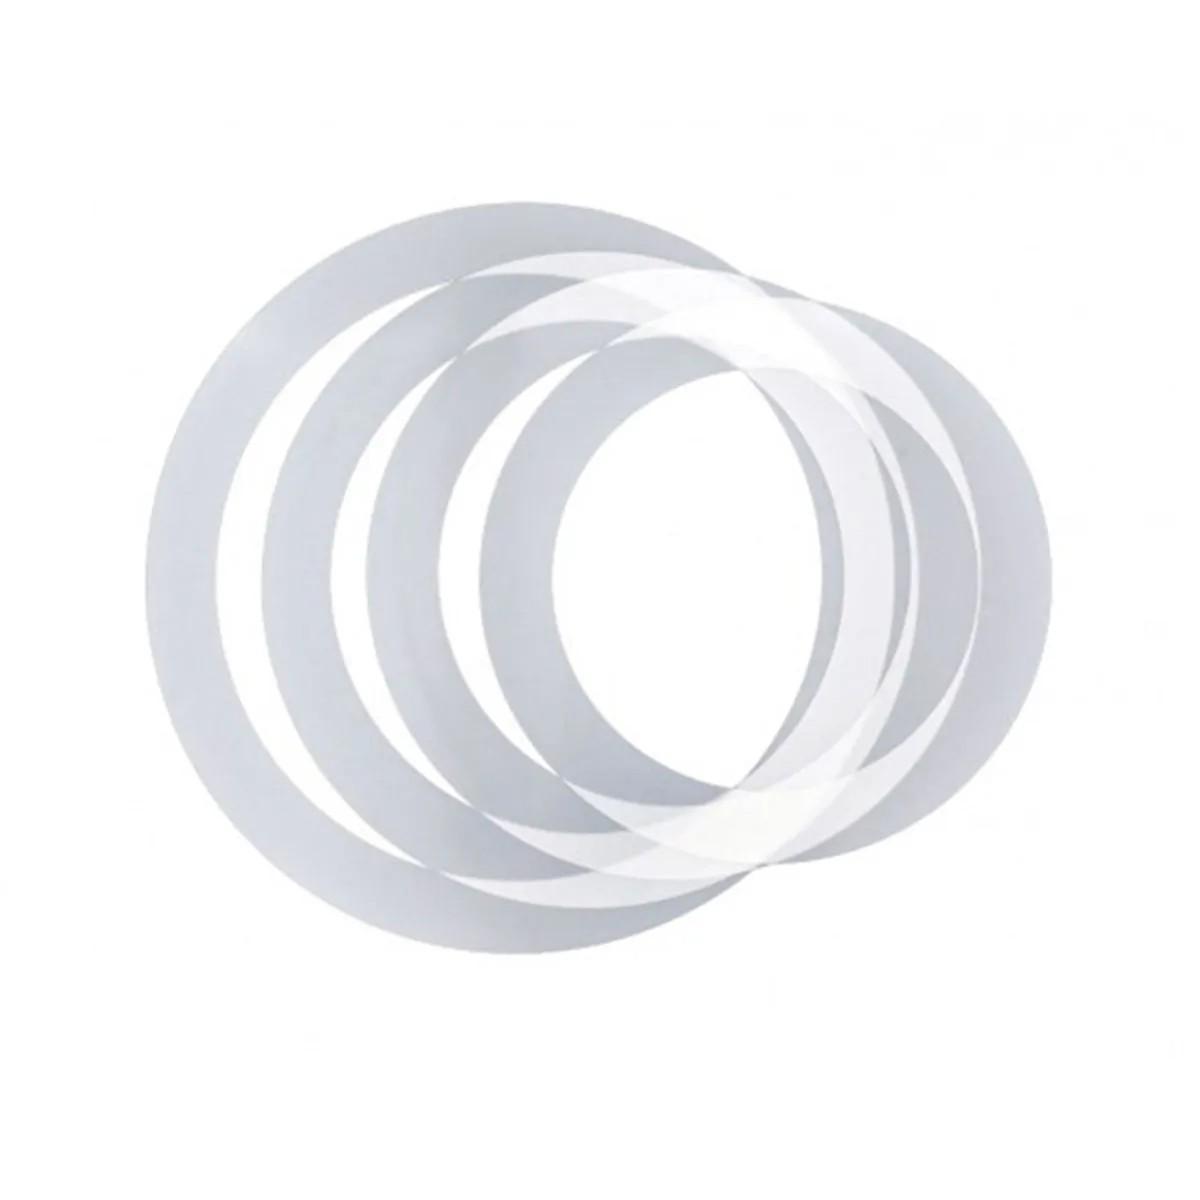 Abafadores Phx Music DH1216 Muffle Rings em PVC para Bateria